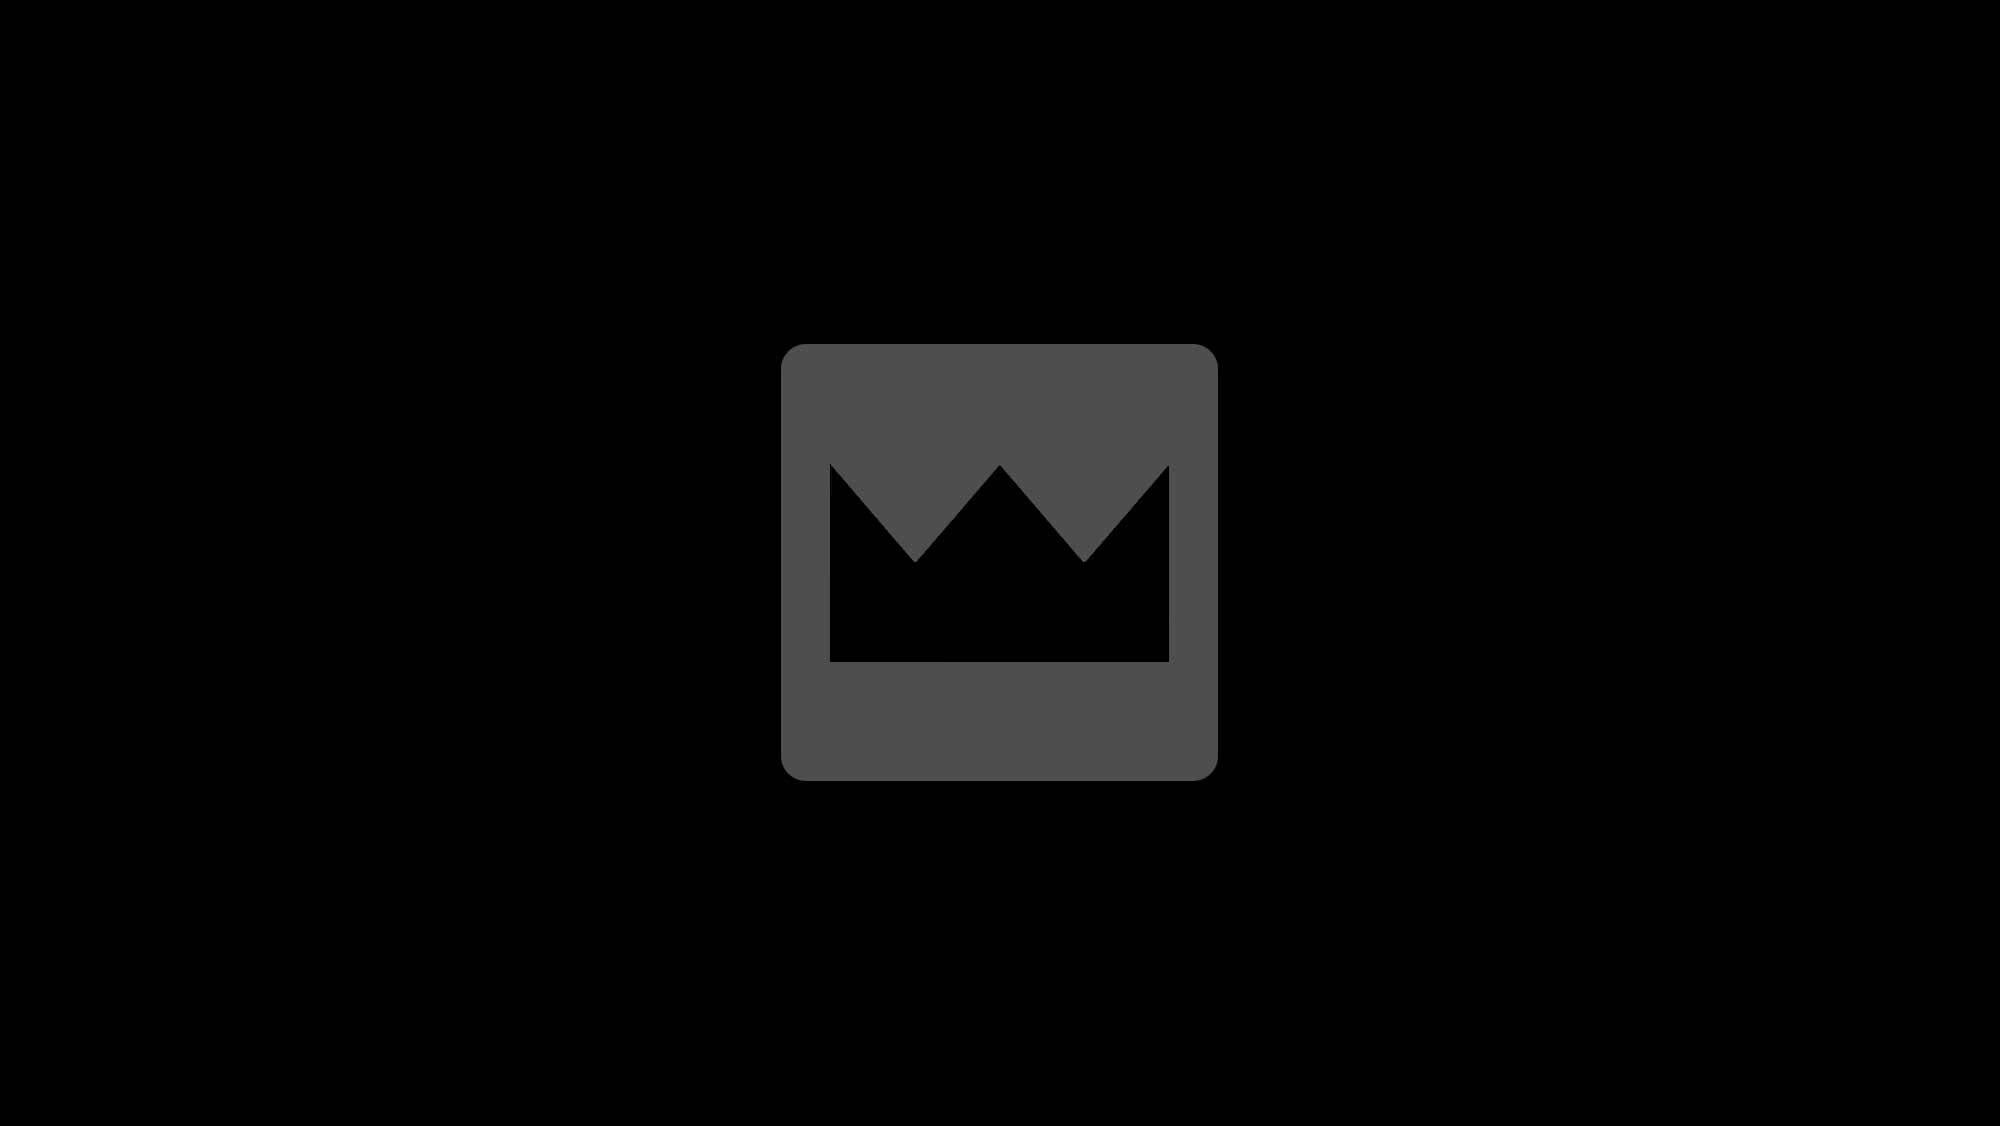 sAWE-redesign-2018 seriesly REDESIGN 2018